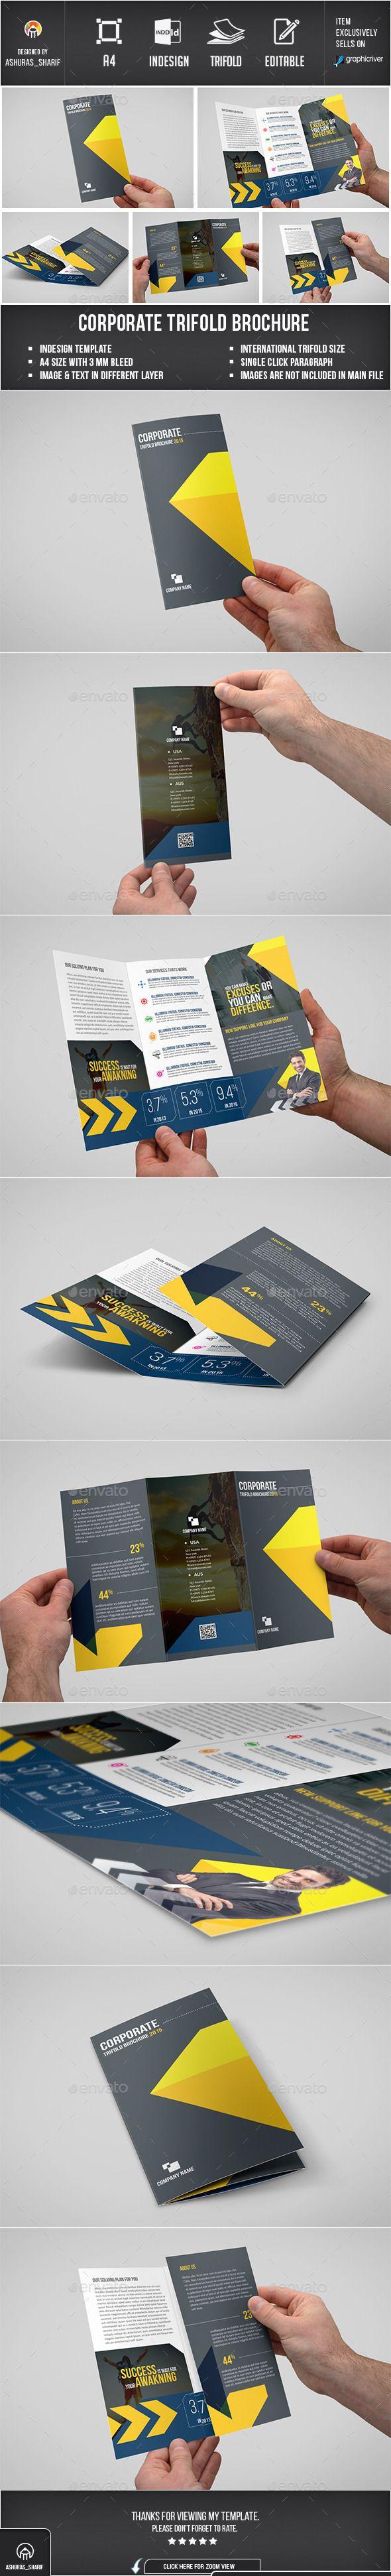 Corporate Trifold Brochure Template #design Download: http://graphicriver.net/item/corporate-trifold-brochure-06/12719870?ref=ksioks